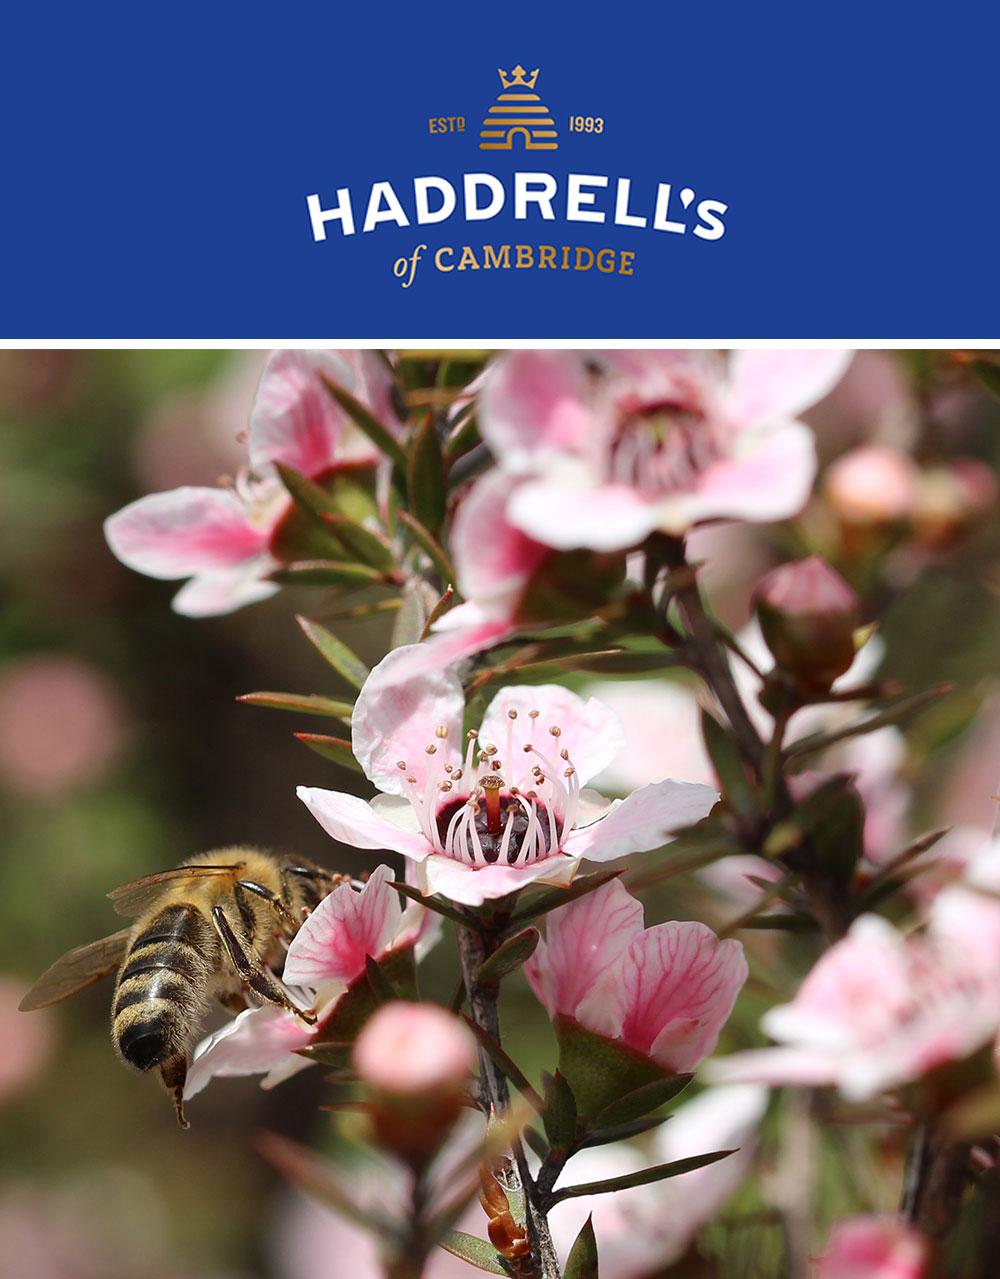 Haddrells-Hero-New.jpg